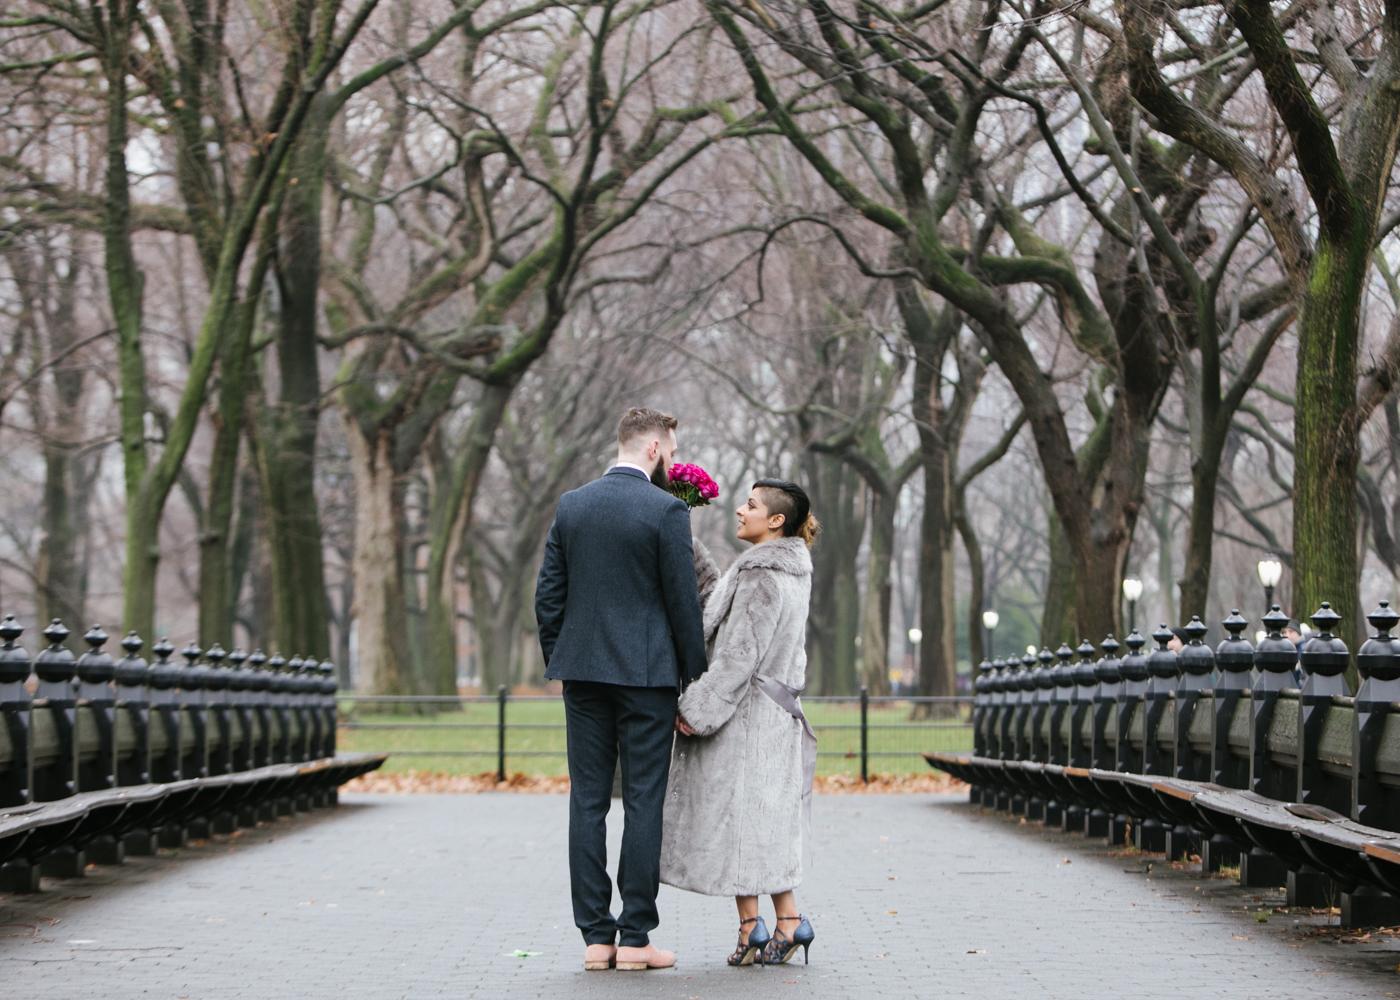 Central-park-wedding-by-Tanya-Isaeva-107.jpg